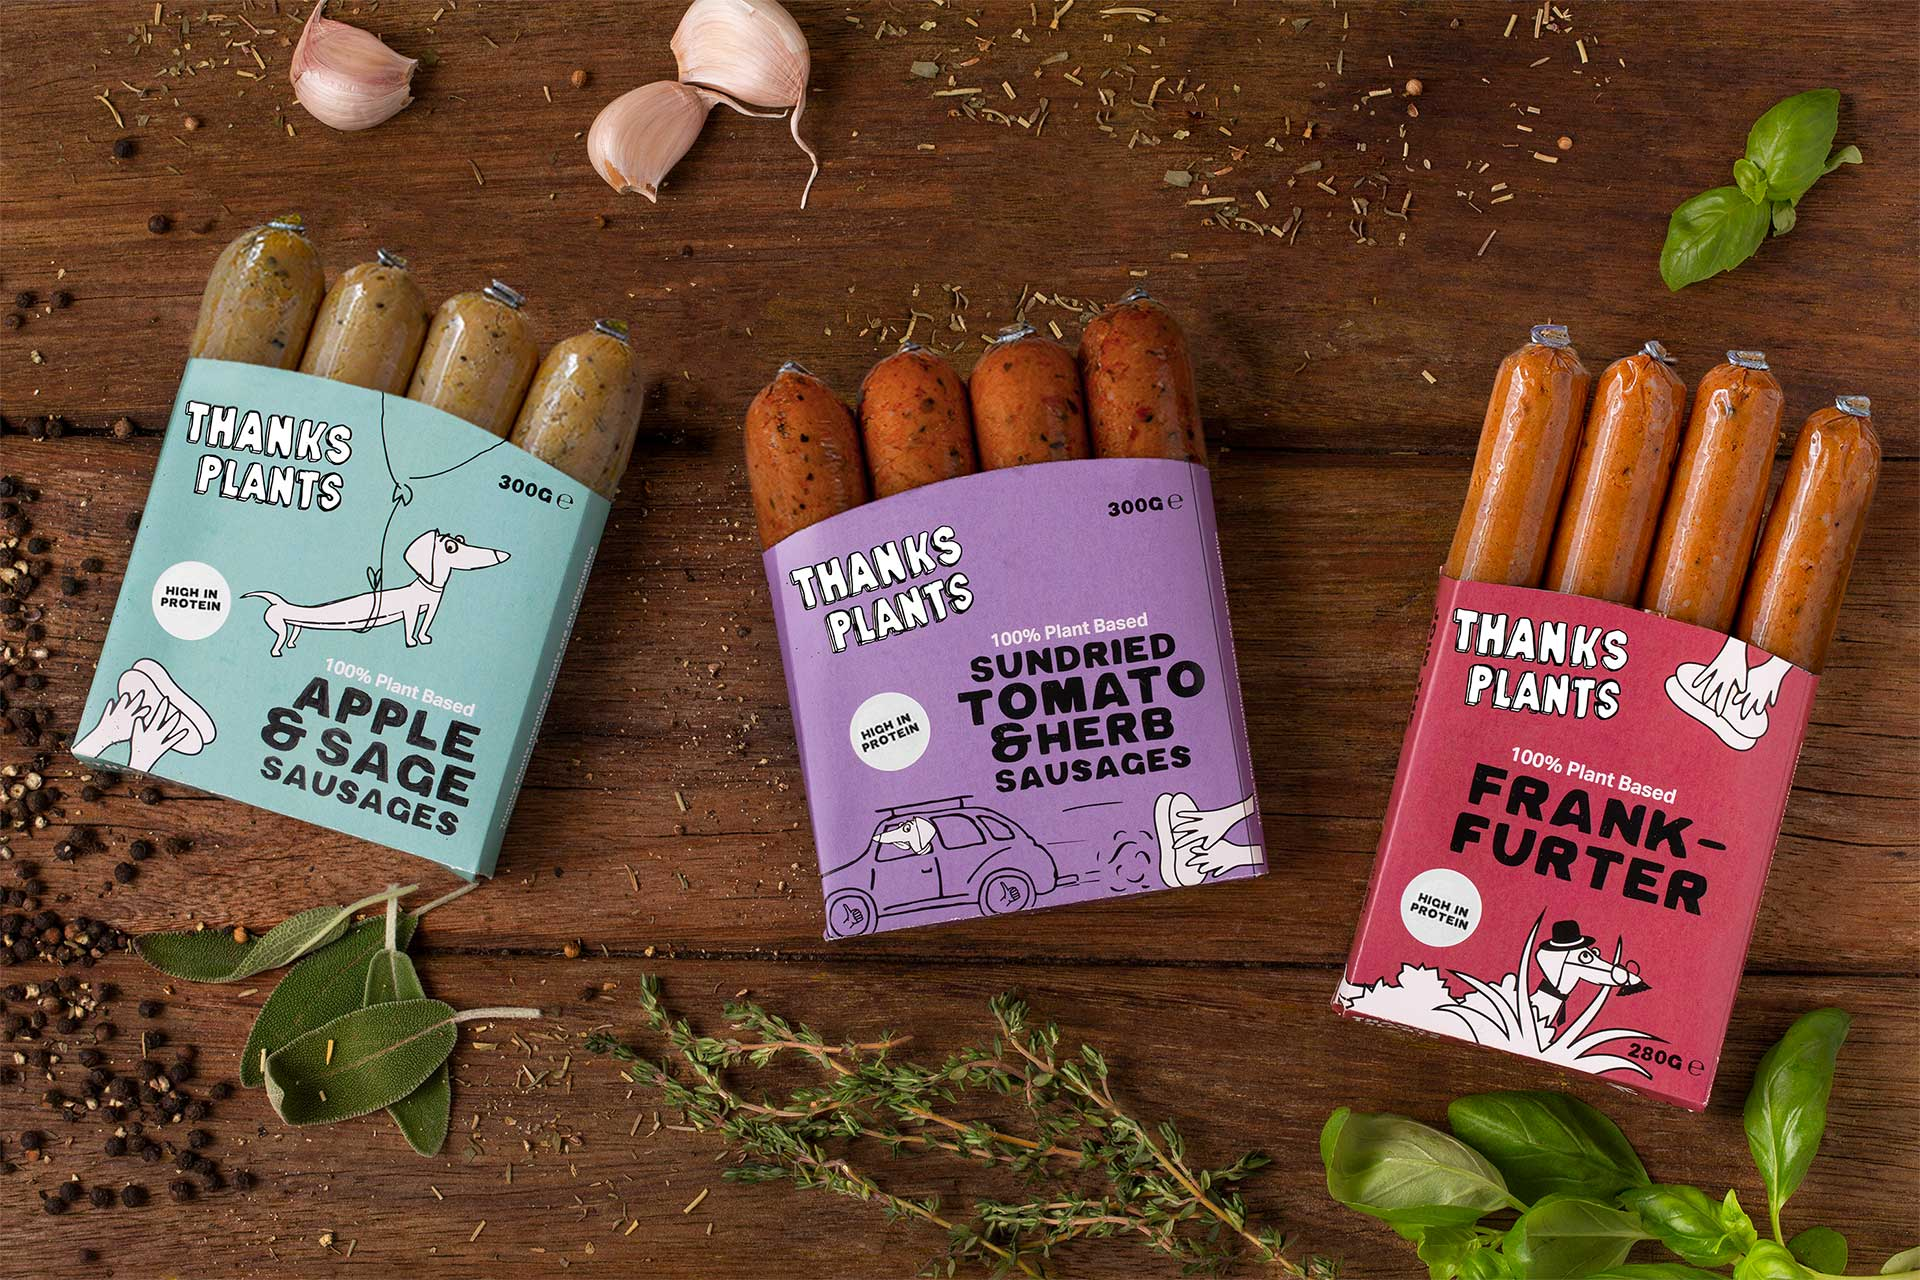 Playful Packaging Design for Plant Based Brand